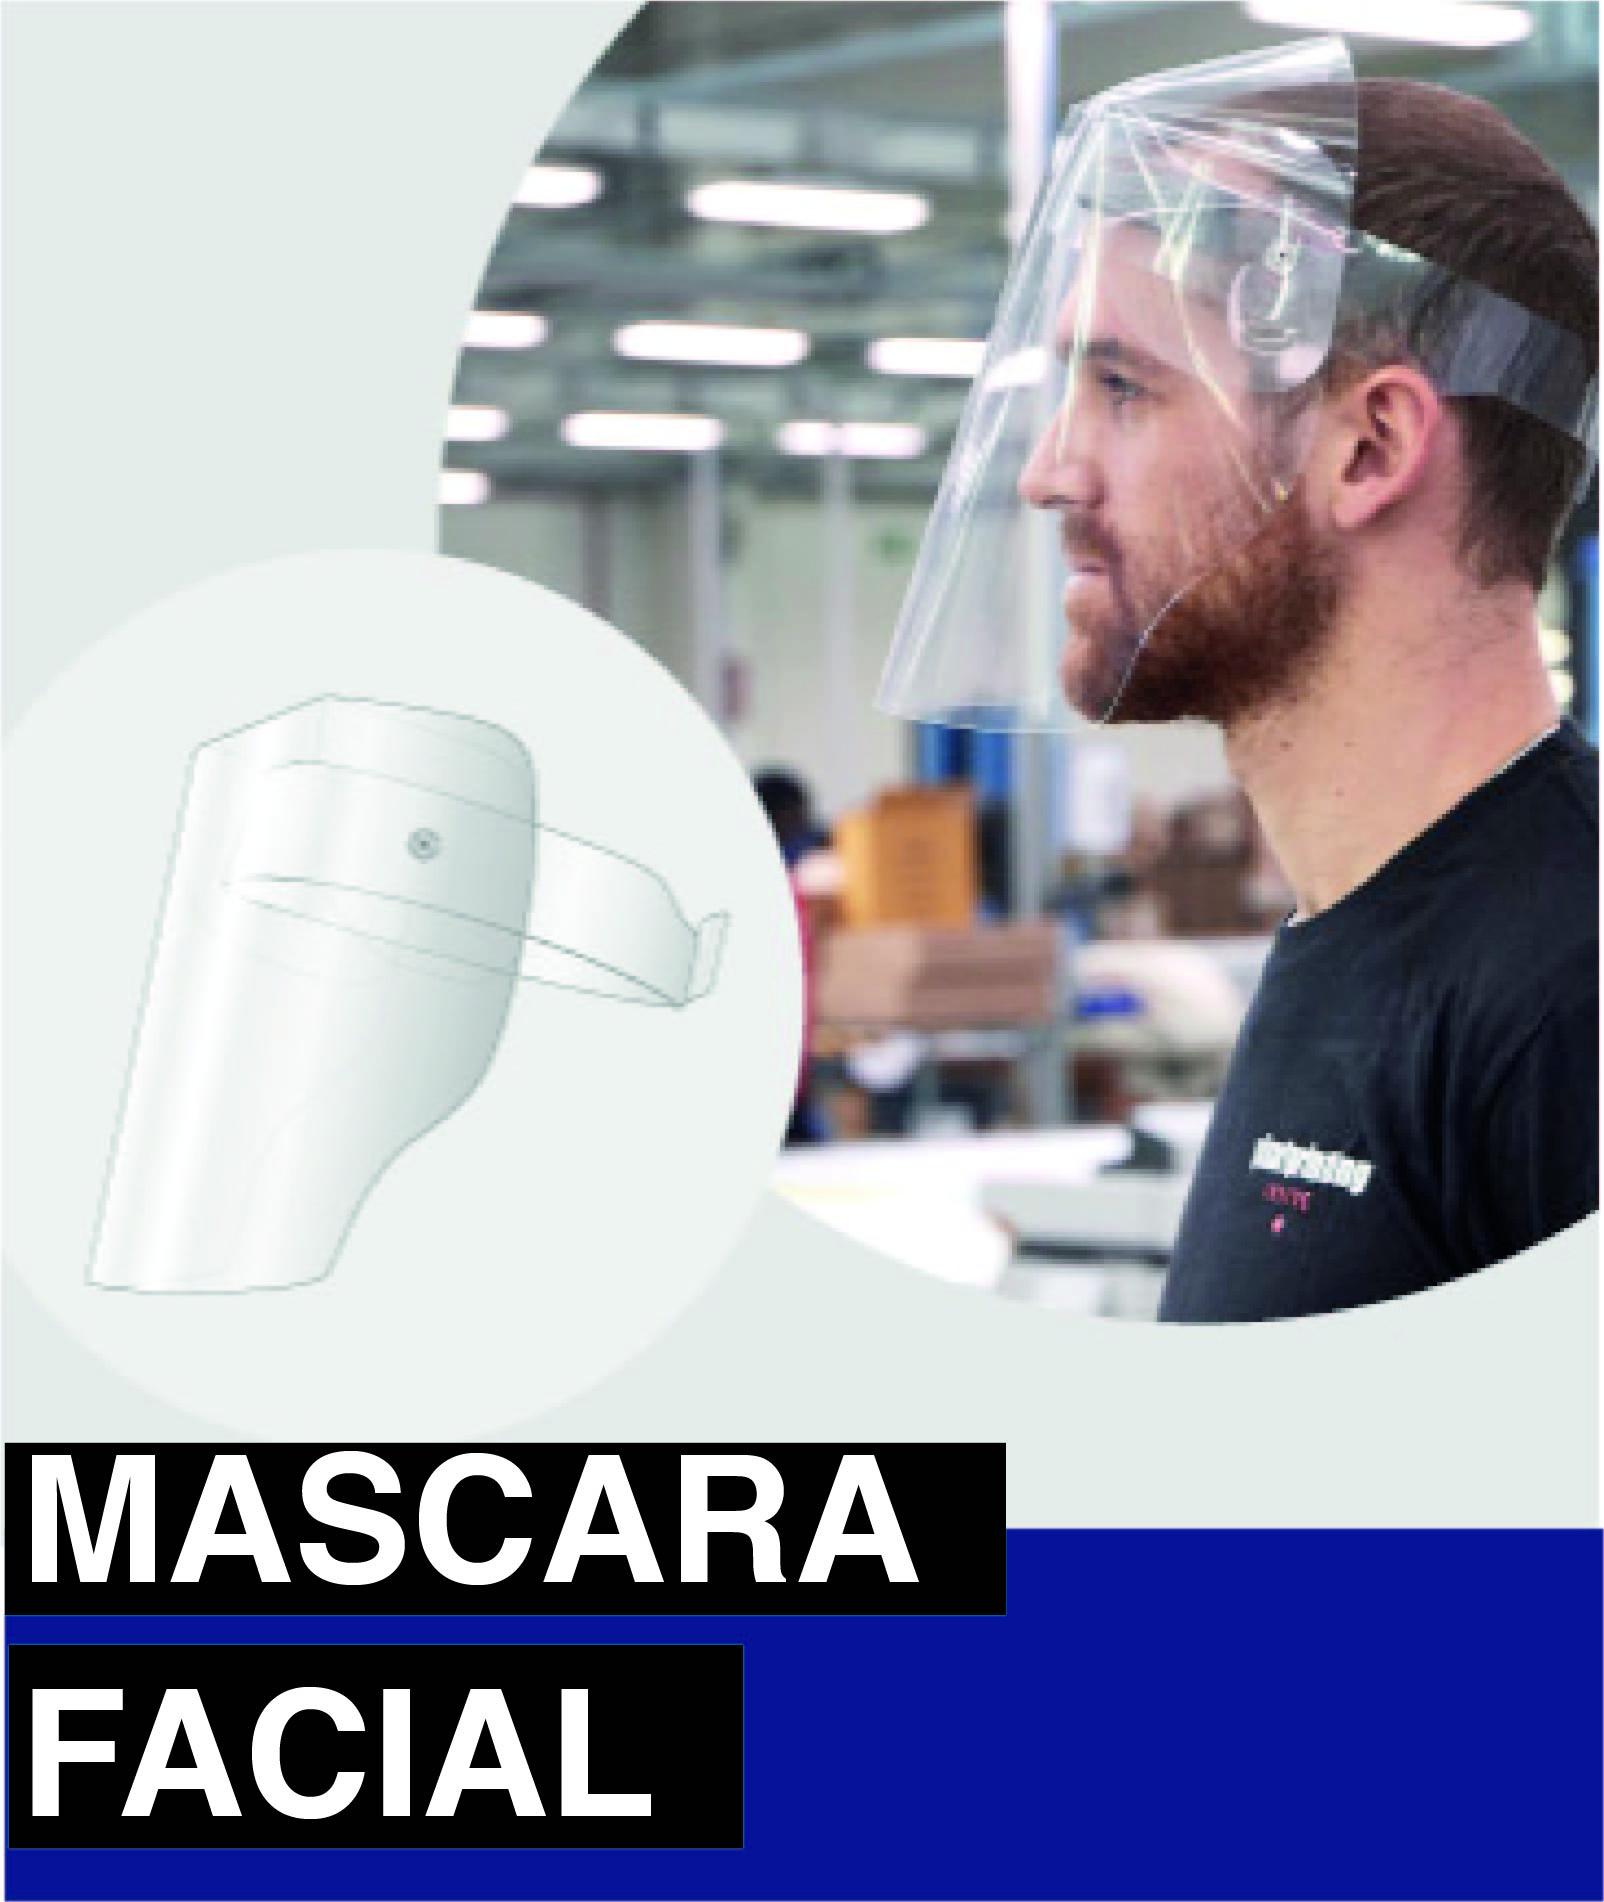 MASCARA-PROTECCIÓN-FACIAL-TRABAJADORES-SEVILLA-TALENTOMARKETINGSOLUTIONS